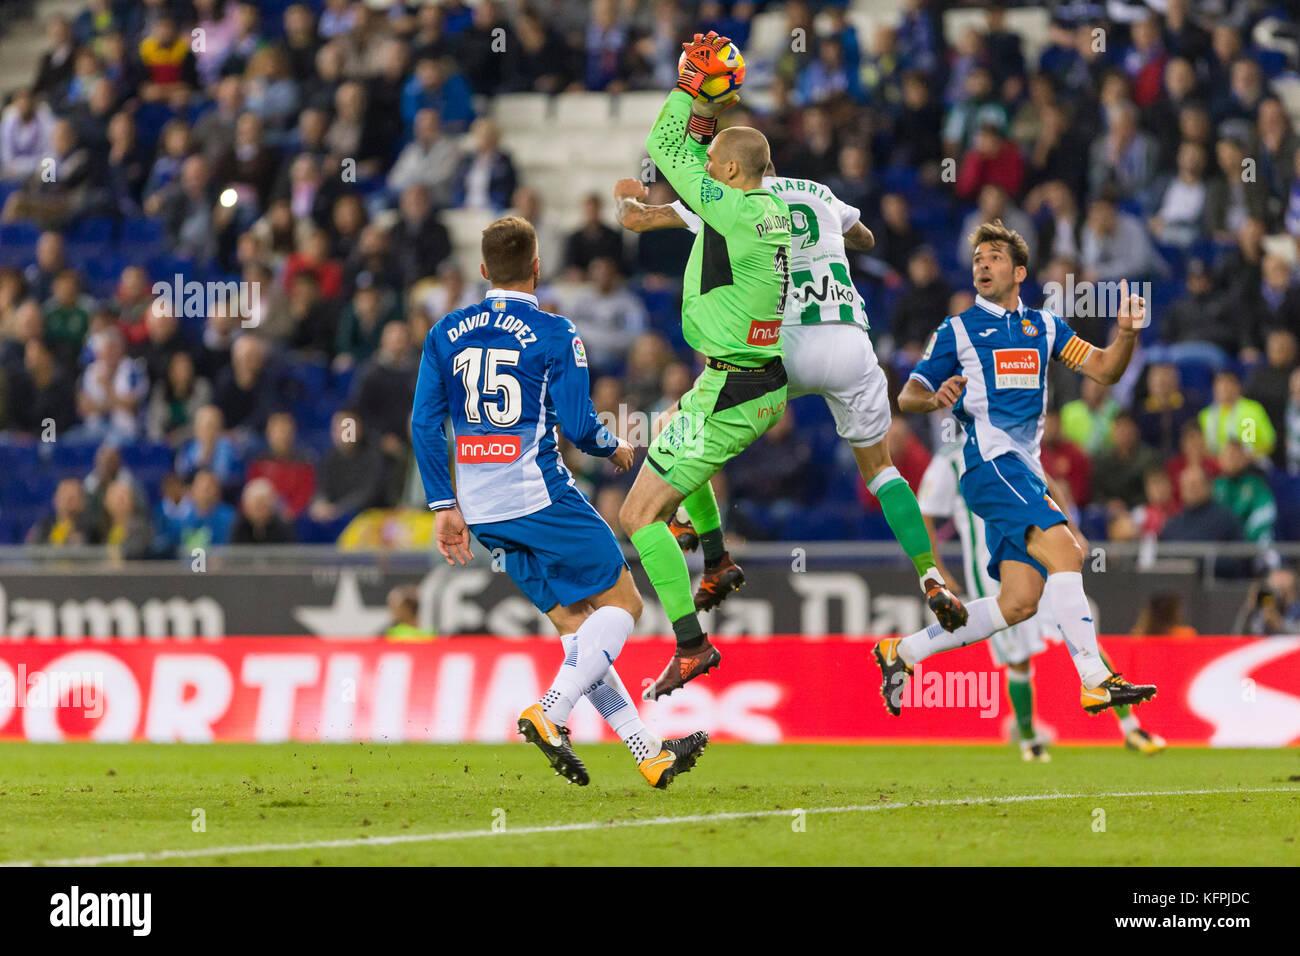 Barcelona, Spain. 30th Oct, 2017. RCD Espanyol goalkeeper Pau Lopez (1) during the match between RCD Espanyol against - Stock Image